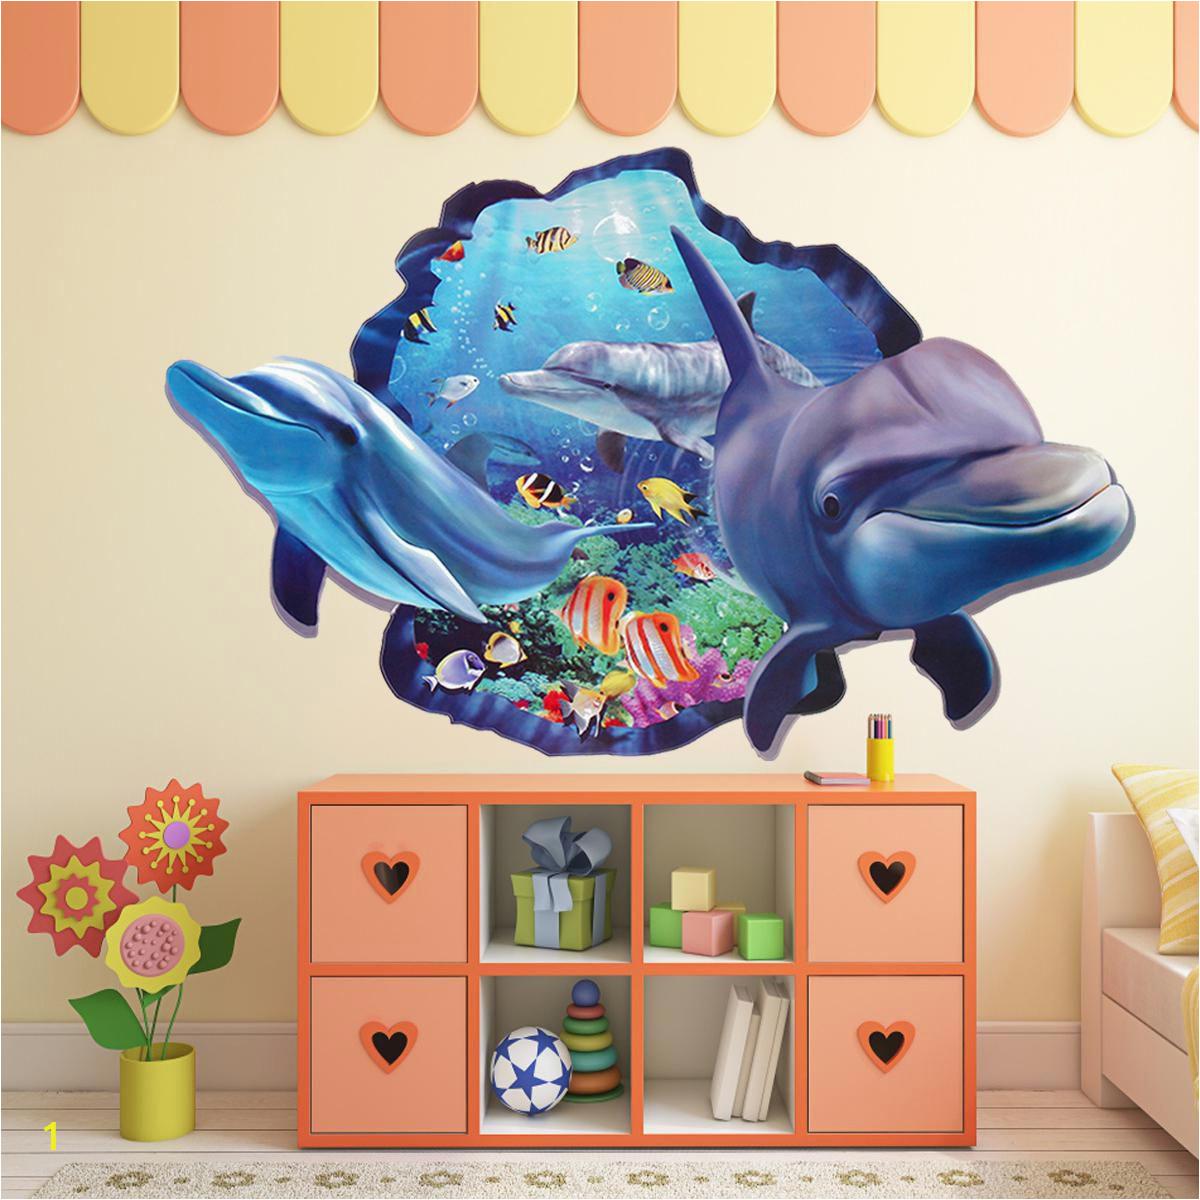 Wall Stickers Ocean DIY Dolphin SDL 1 33ba4 JPEG